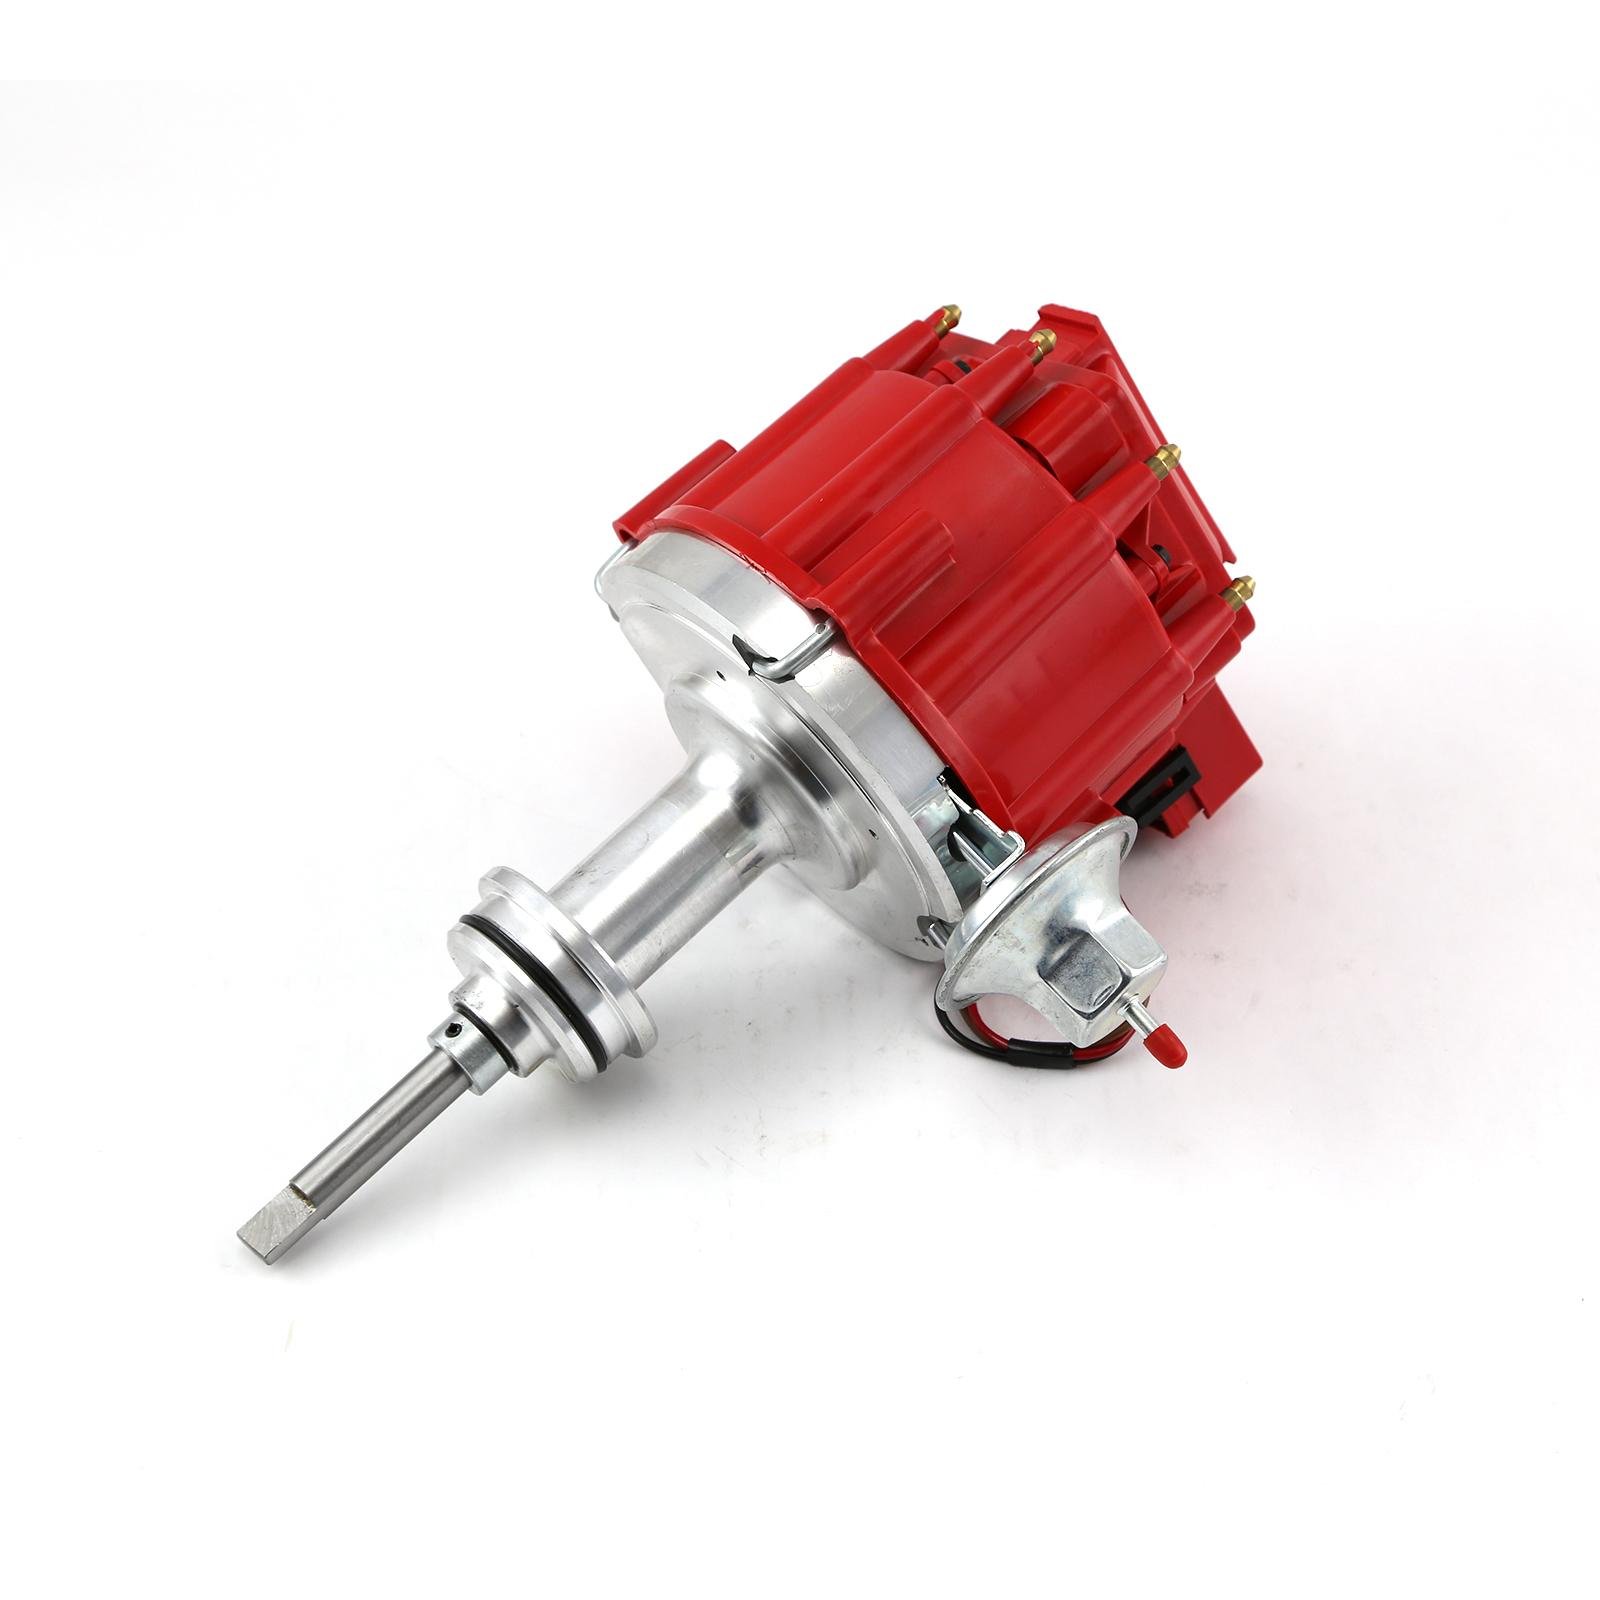 Mopar-Chrysler-SB-318-340-360-65K-Coil-HEI-Electronic-Distributor